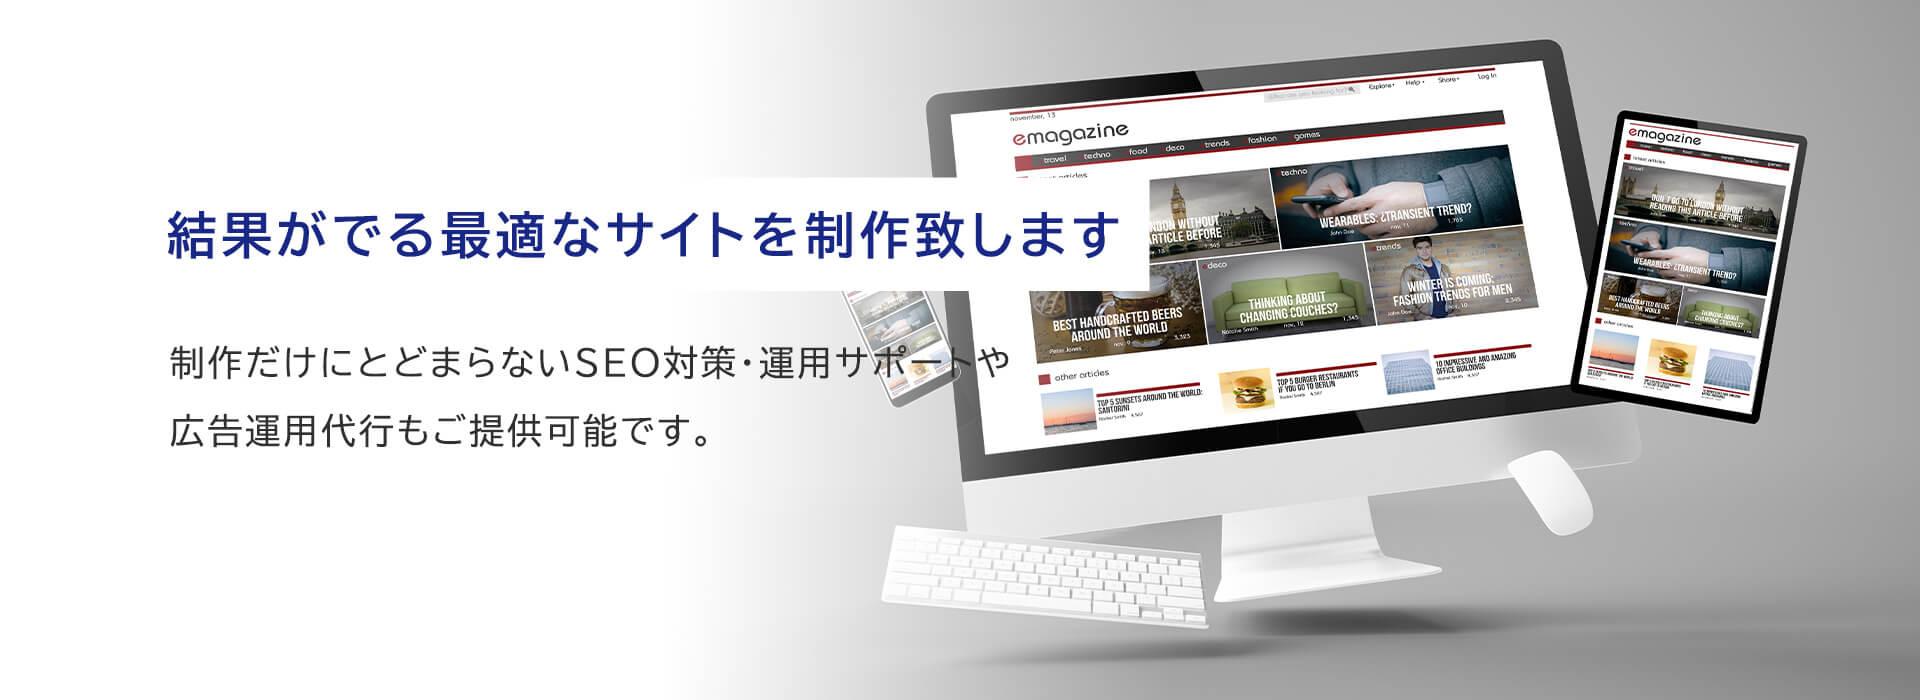 WEB・ECサイト・オウンメディア制作